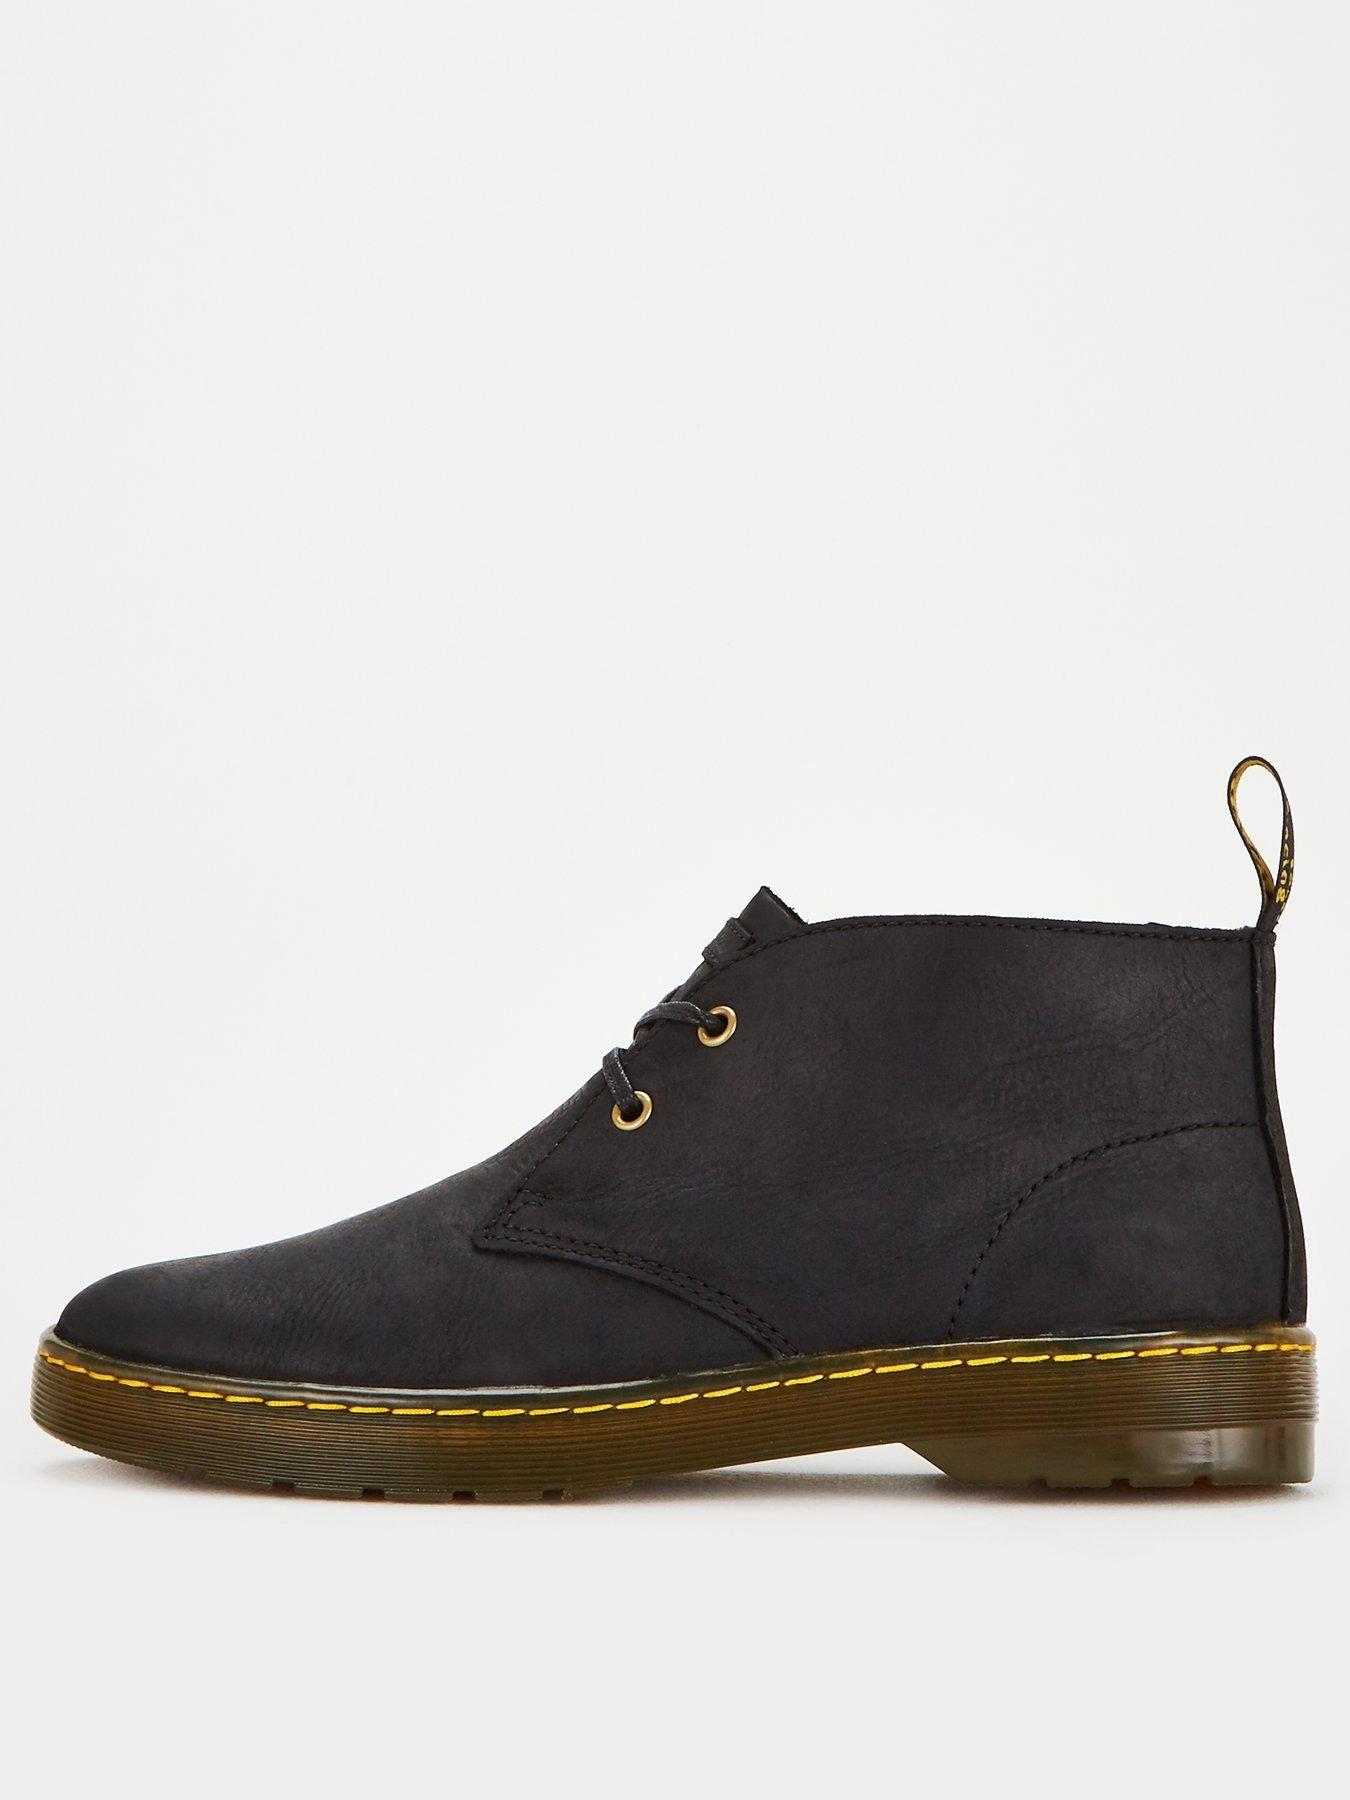 Dr Martens Cruise Cabrillo Chukka Boot | Black boots, Desert